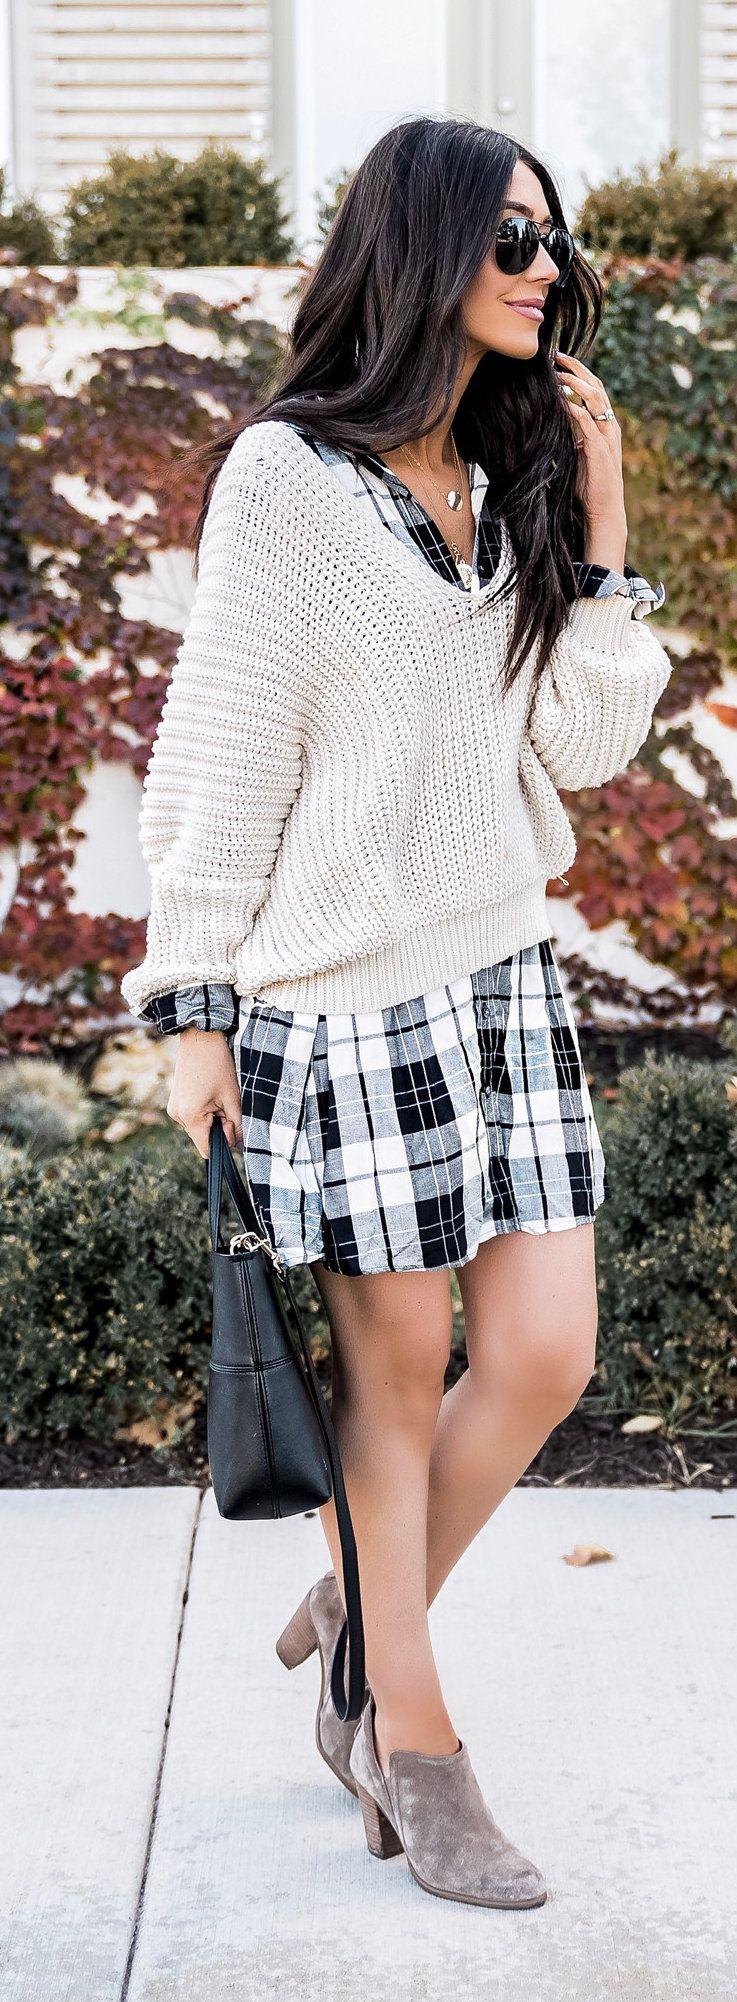 white knit sweater; black and white gingham mini dress